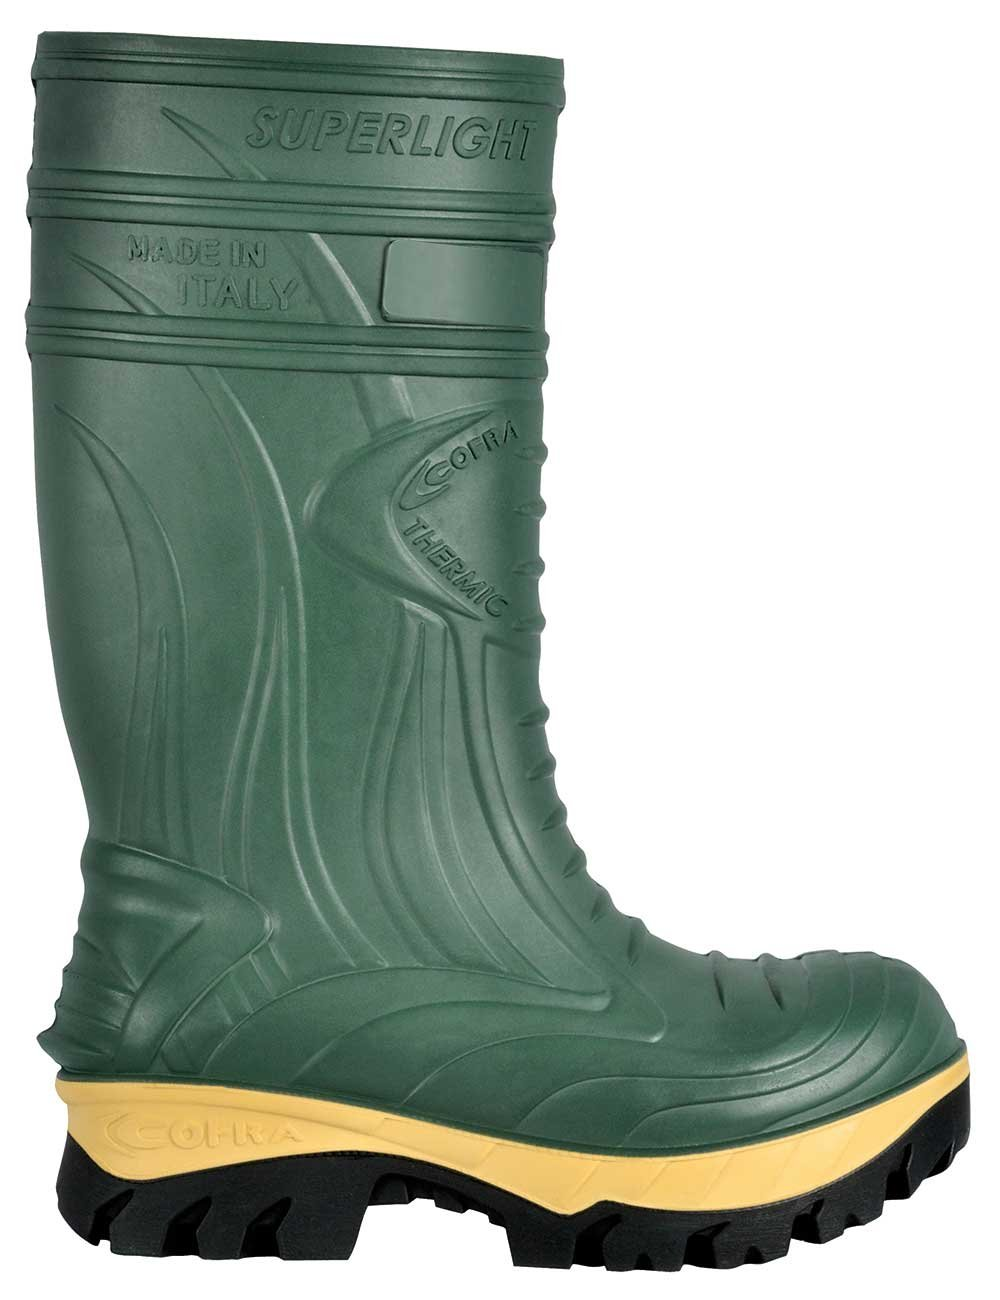 Cofra 00040-CU8.W11 Thermic Metguard EH PR Safety Boots, 11, Dark Green